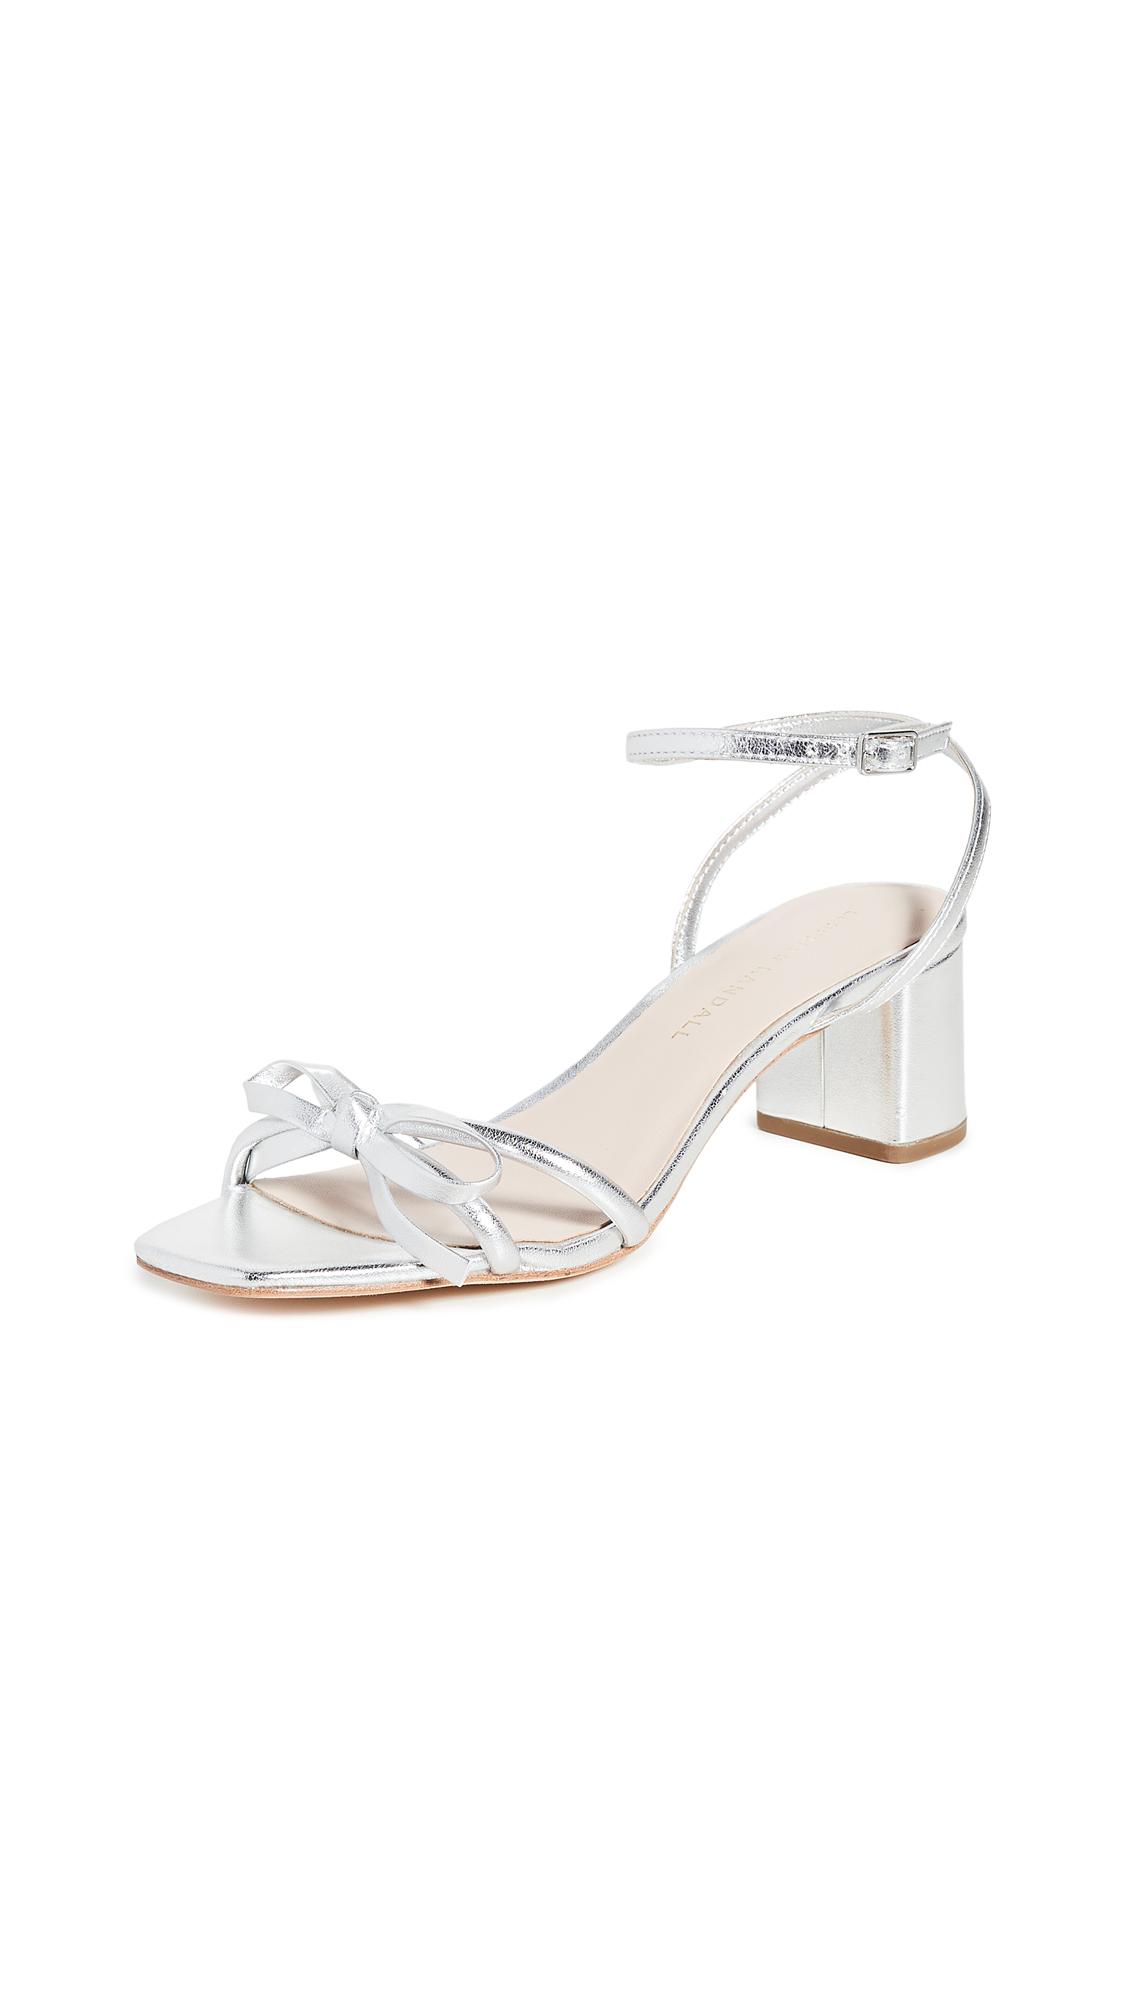 Buy Loeffler Randall Gracie Skinny Strap Bow Low Heel Sandals online, shop Loeffler Randall